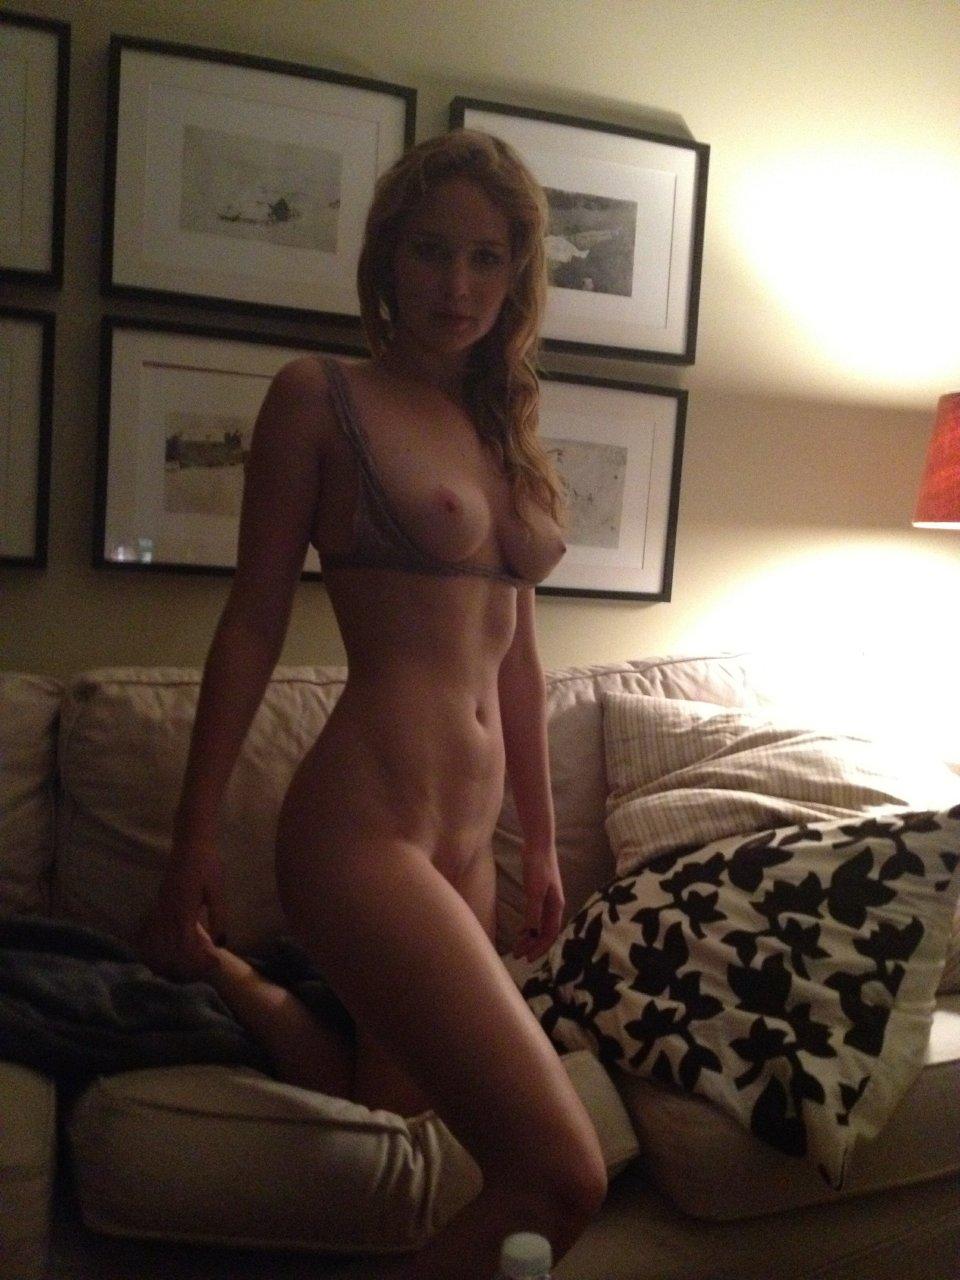 Tumblr leaked nudes Margot Robbie